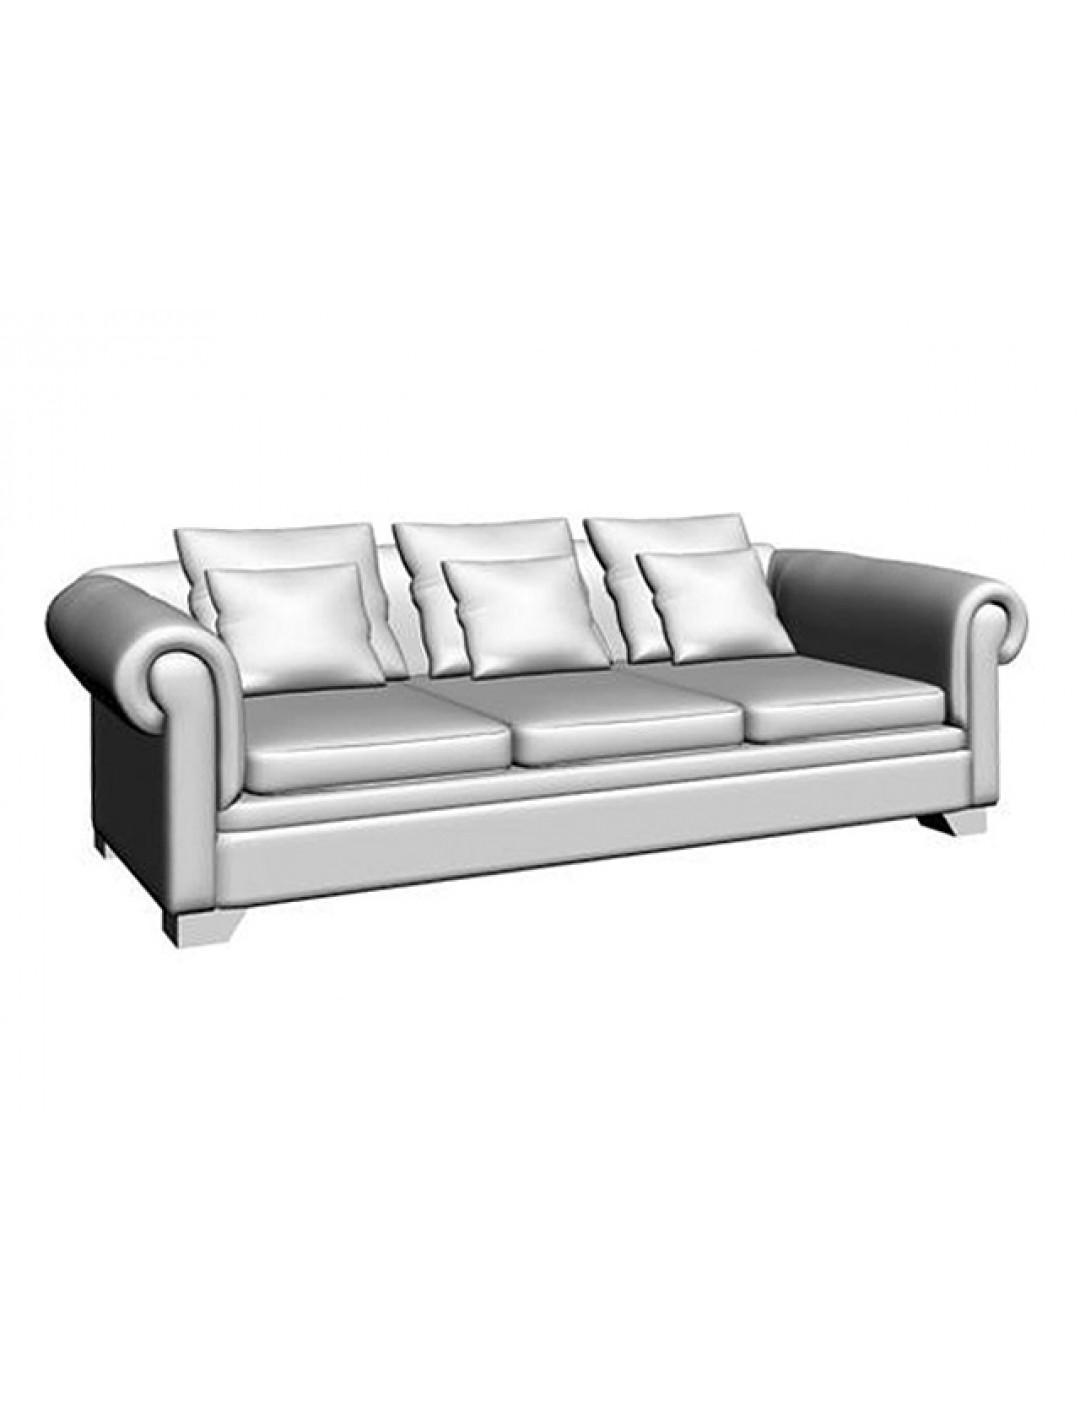 VICTORIA 3-SEAT SOFA,THREE PILLOW 60X60,THREE PILLOW 45X45 CM, C.O.M.